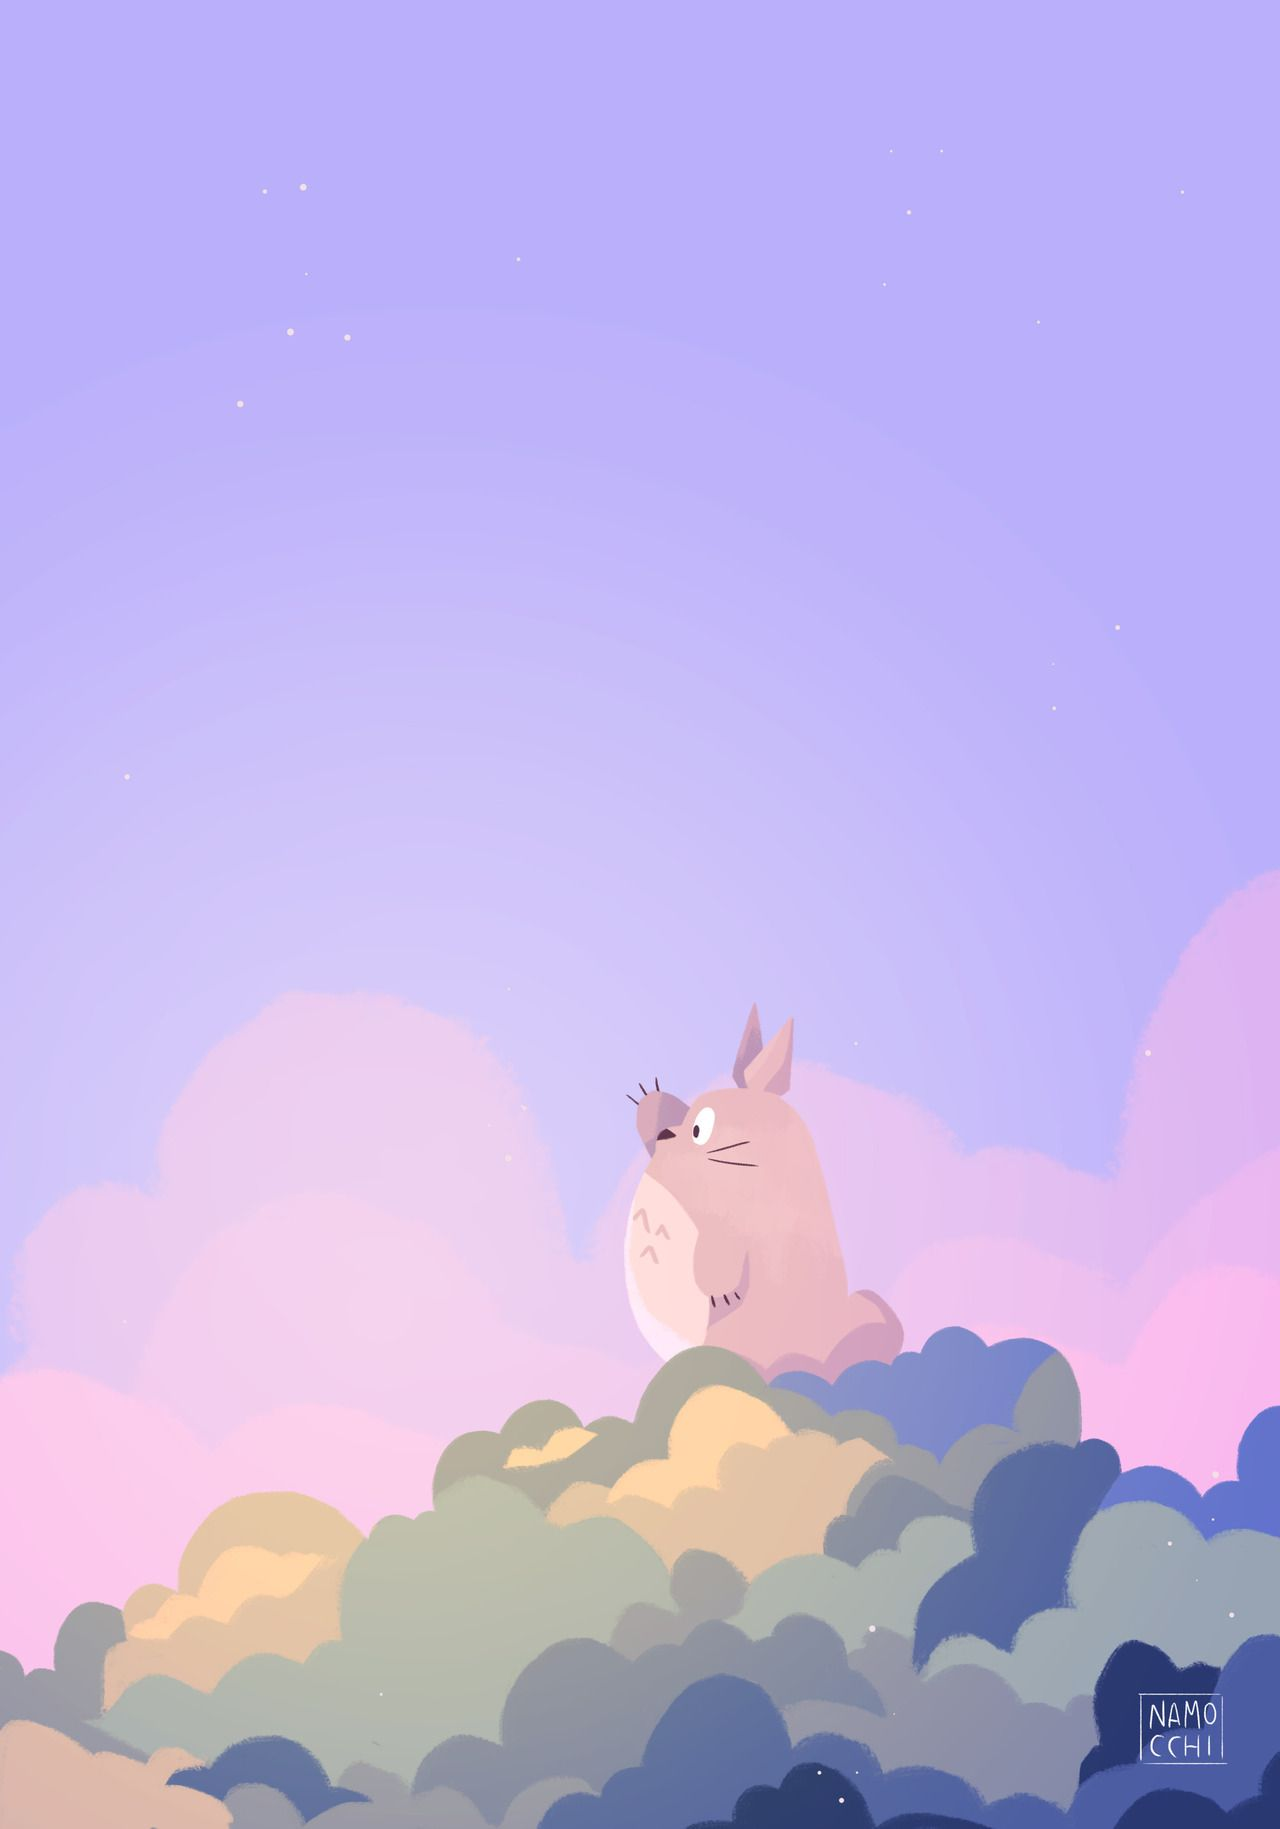 Studio Ghibli Ghibli Artwork Totoro Art Ghibli Art